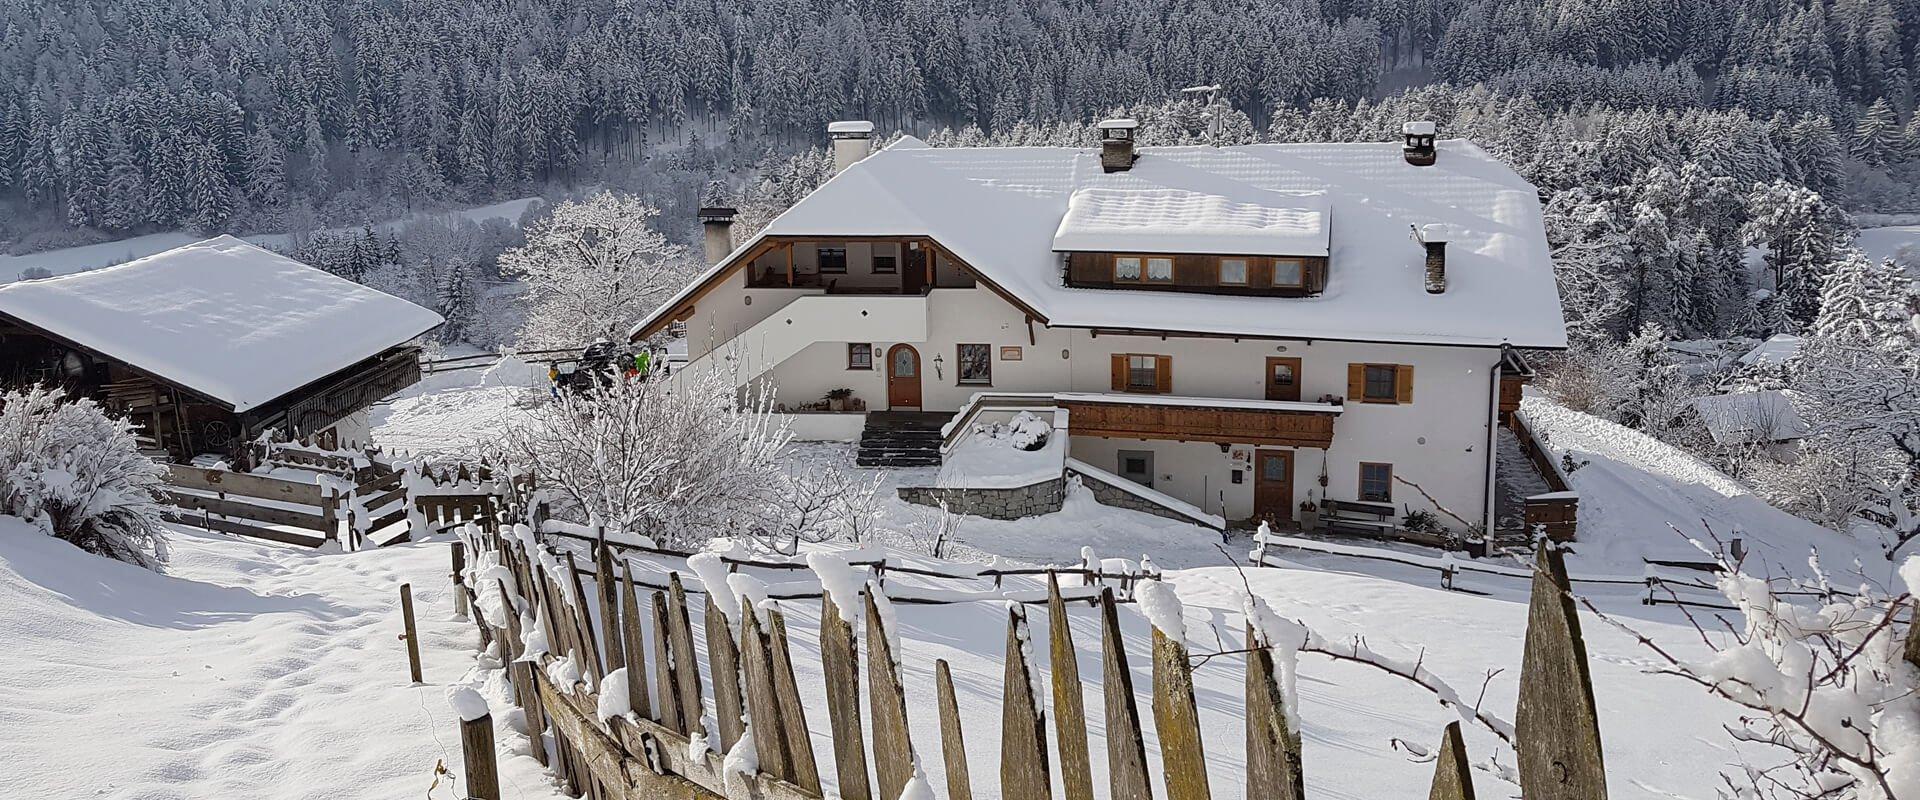 winterurlaub-pustertal